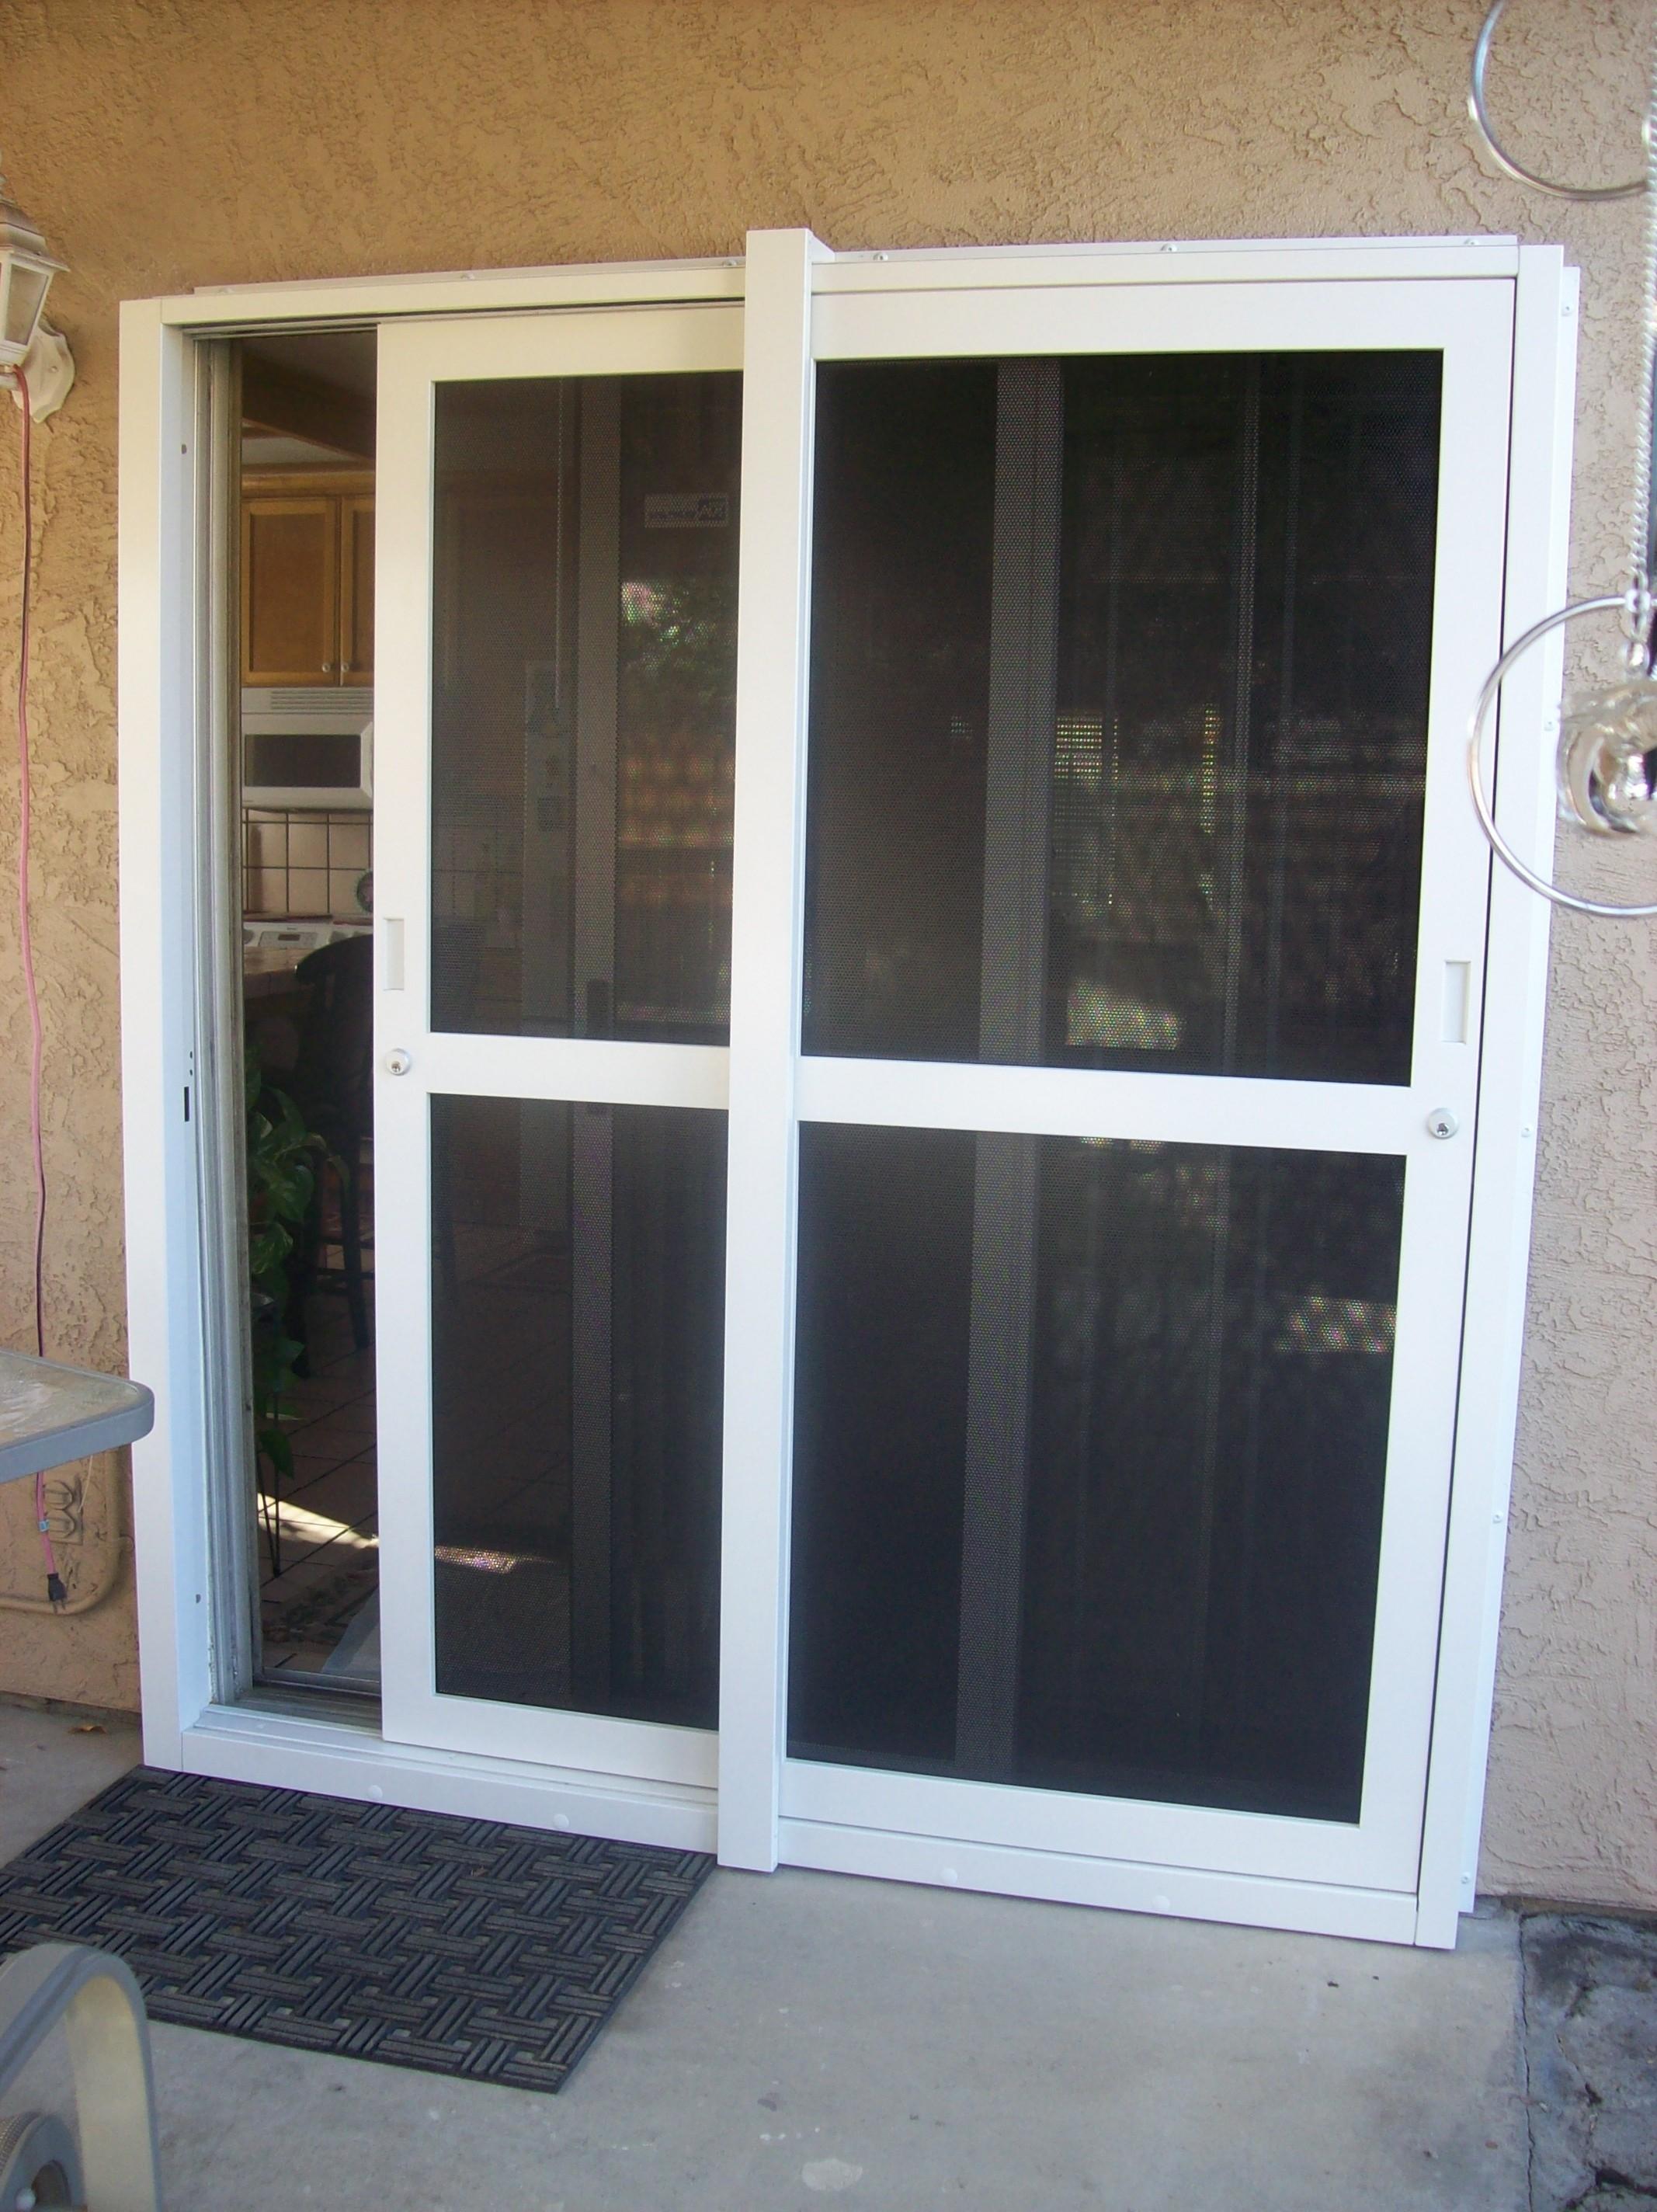 Pella Sliding Glass Doors Screenspella sliding door screen saudireiki